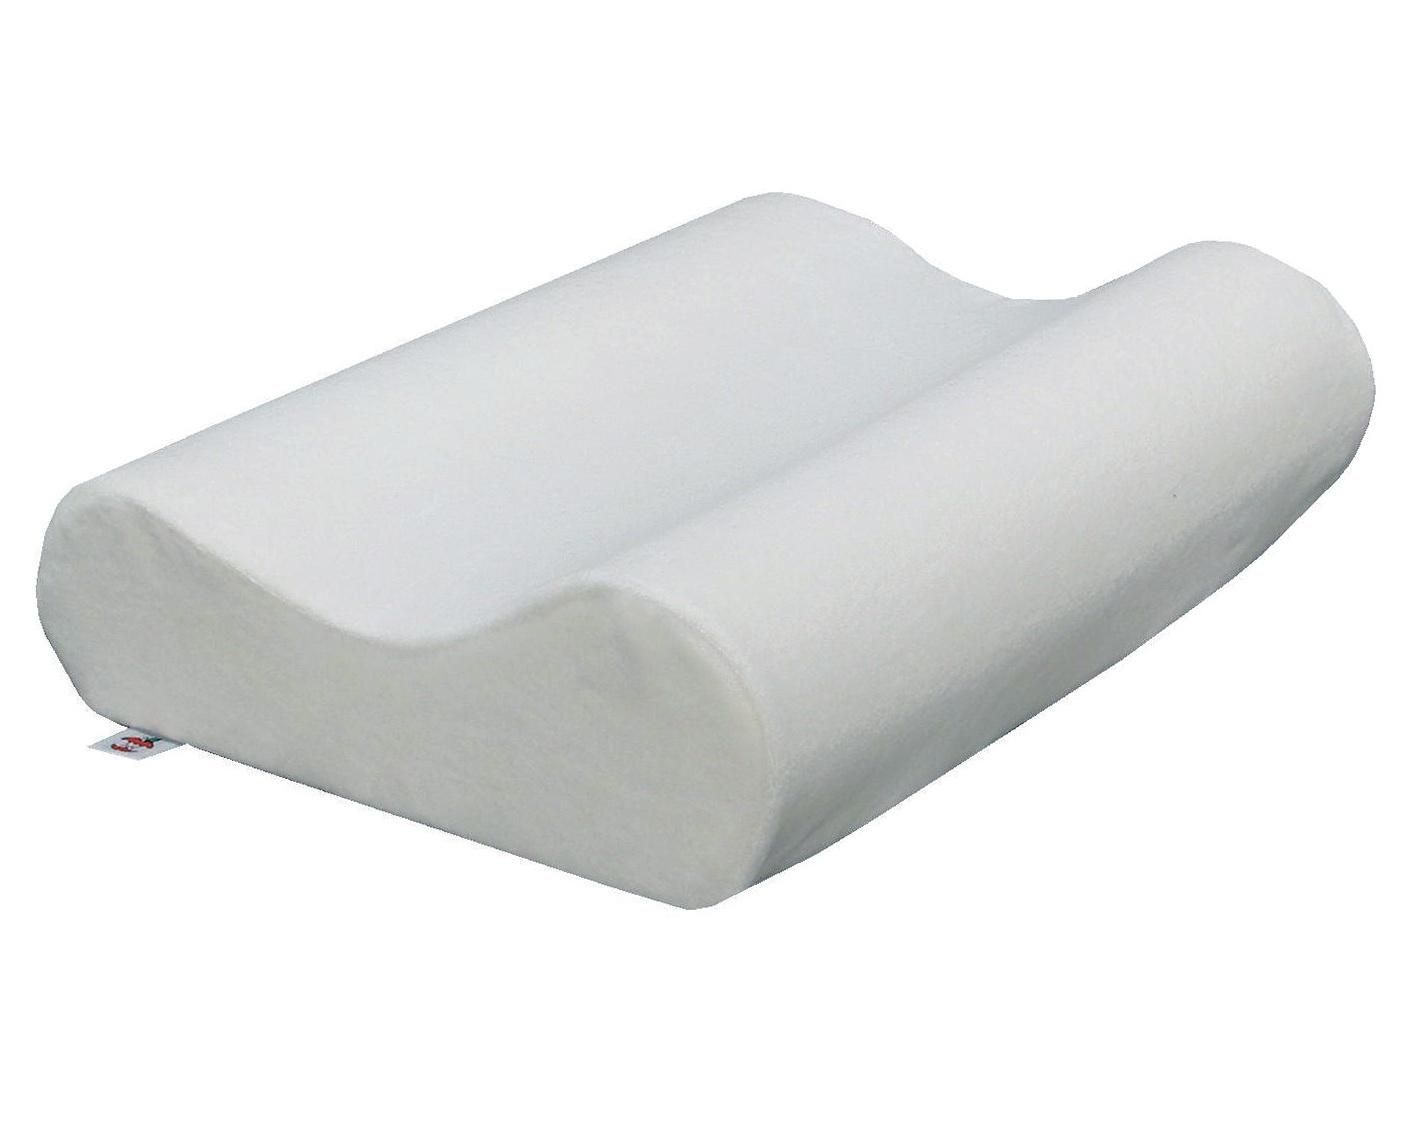 Foam For Cushions Walmart